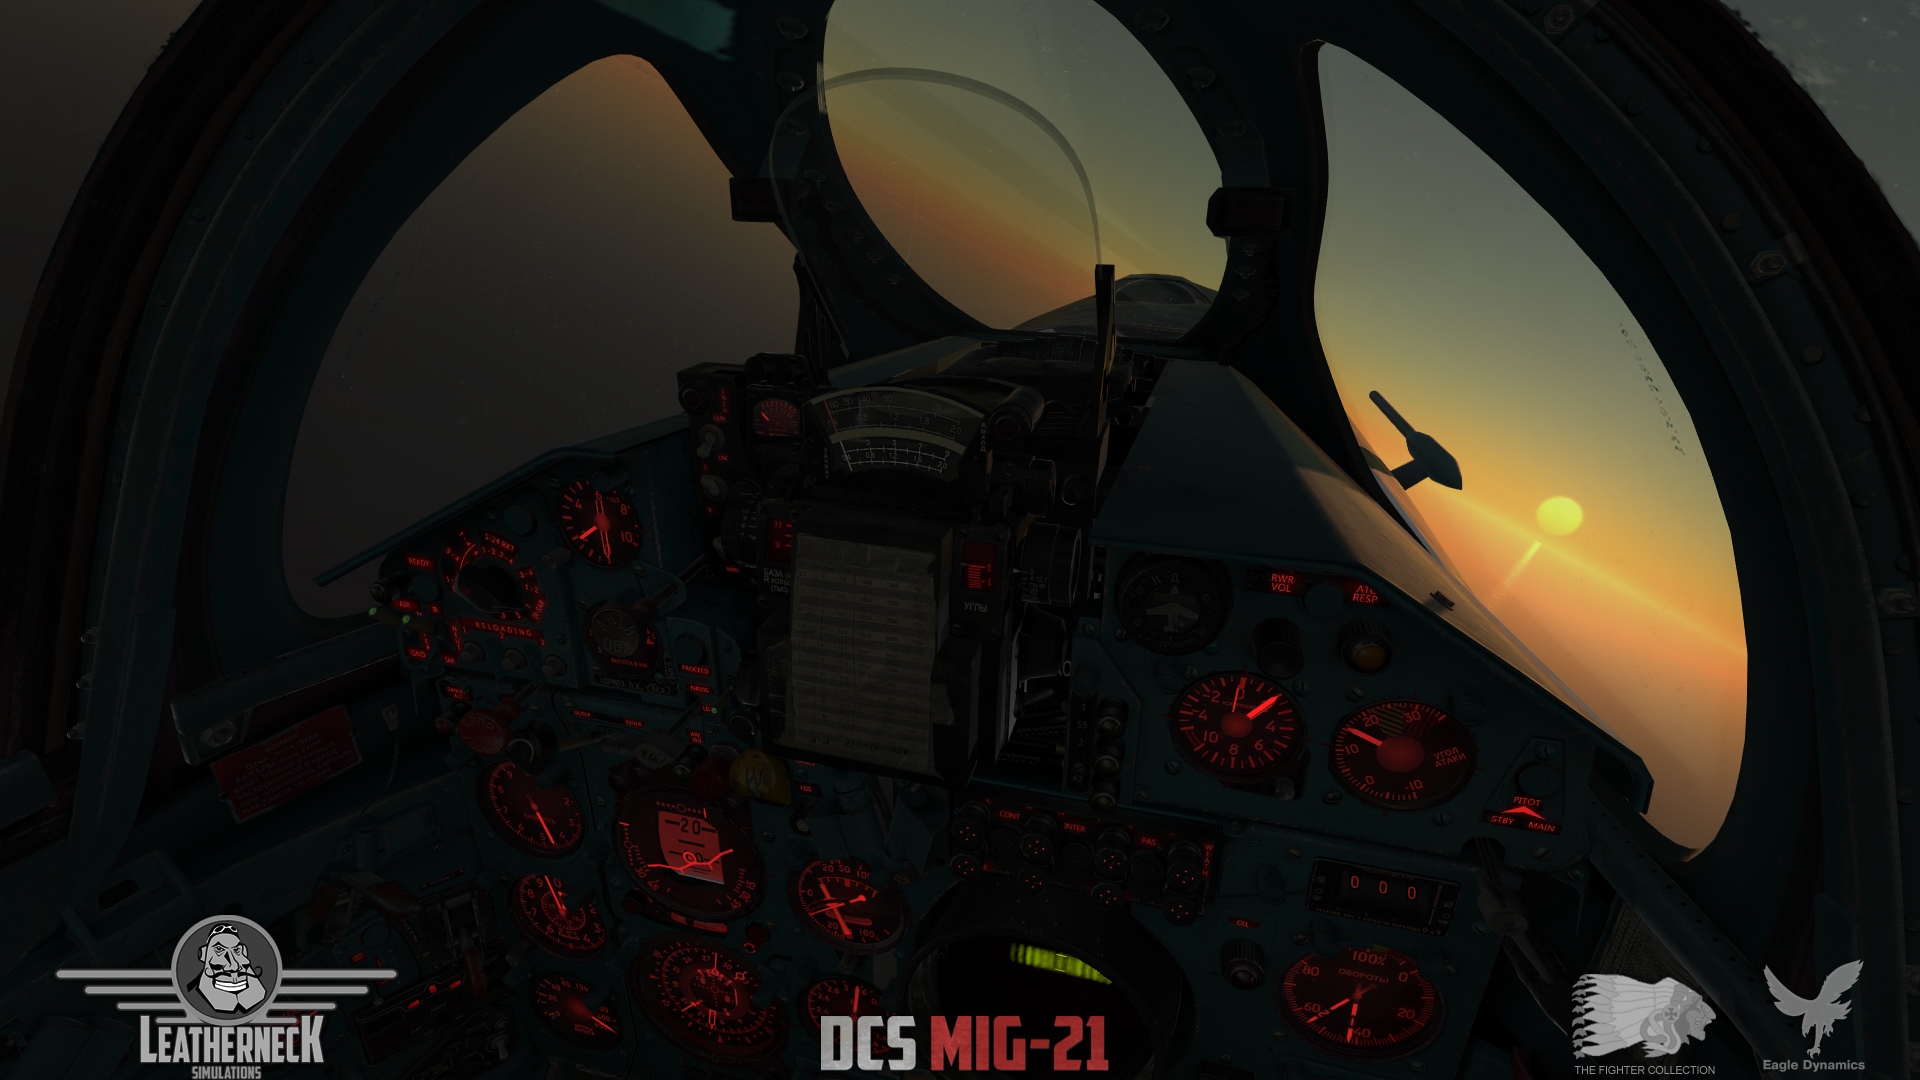 DCS MiG-21bis – Leatherneck Simulations